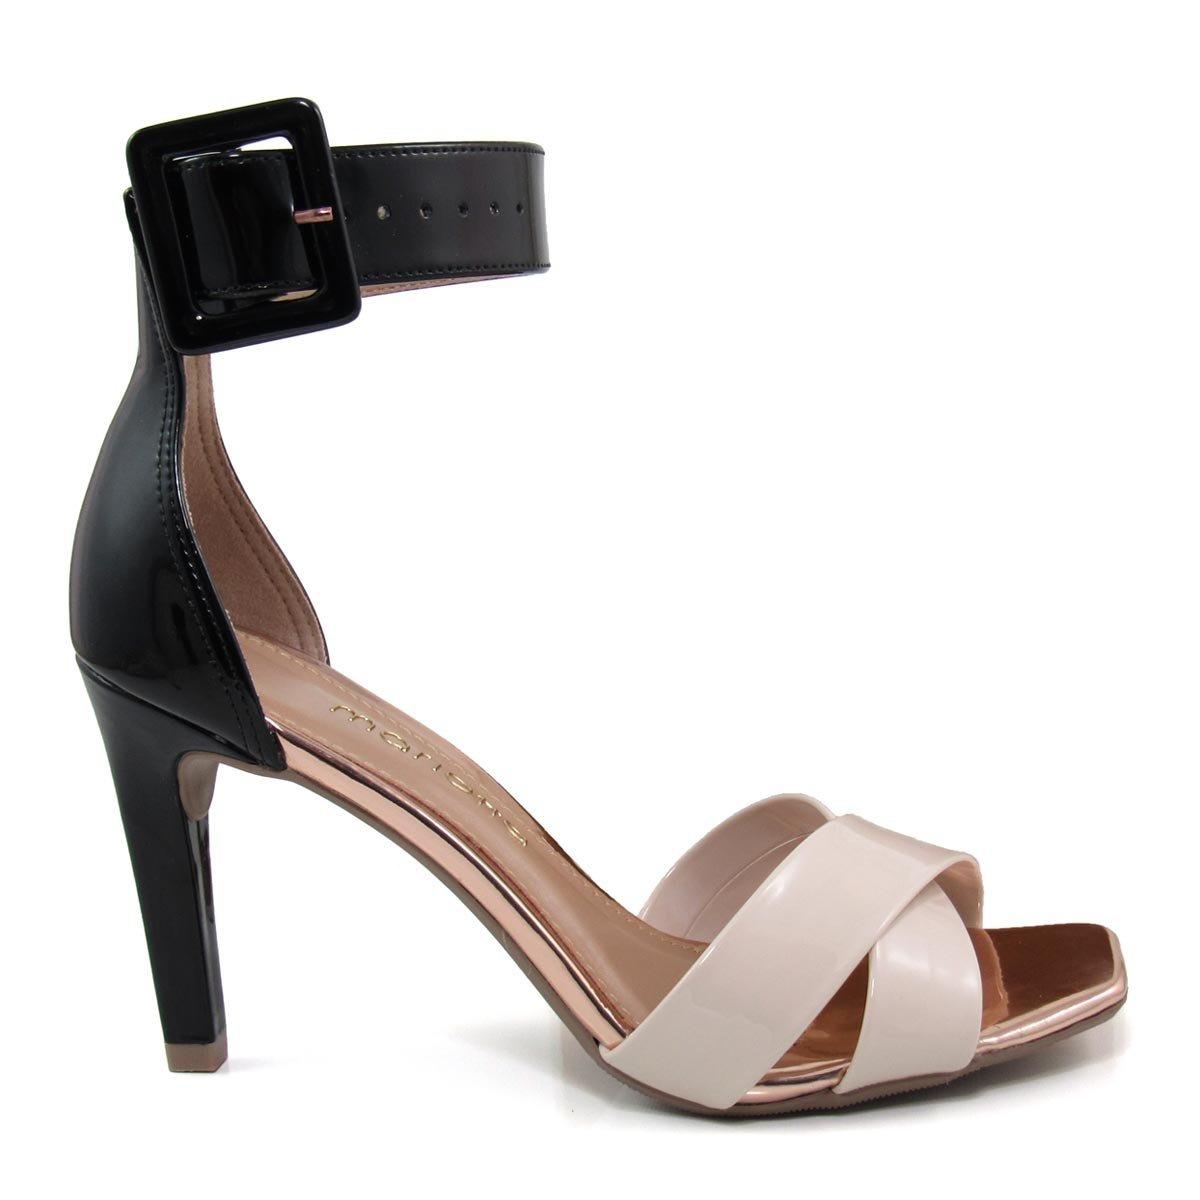 492ae2cedd sandália feminina salto fino mariotta 18110-06 verniz. Carregando zoom.